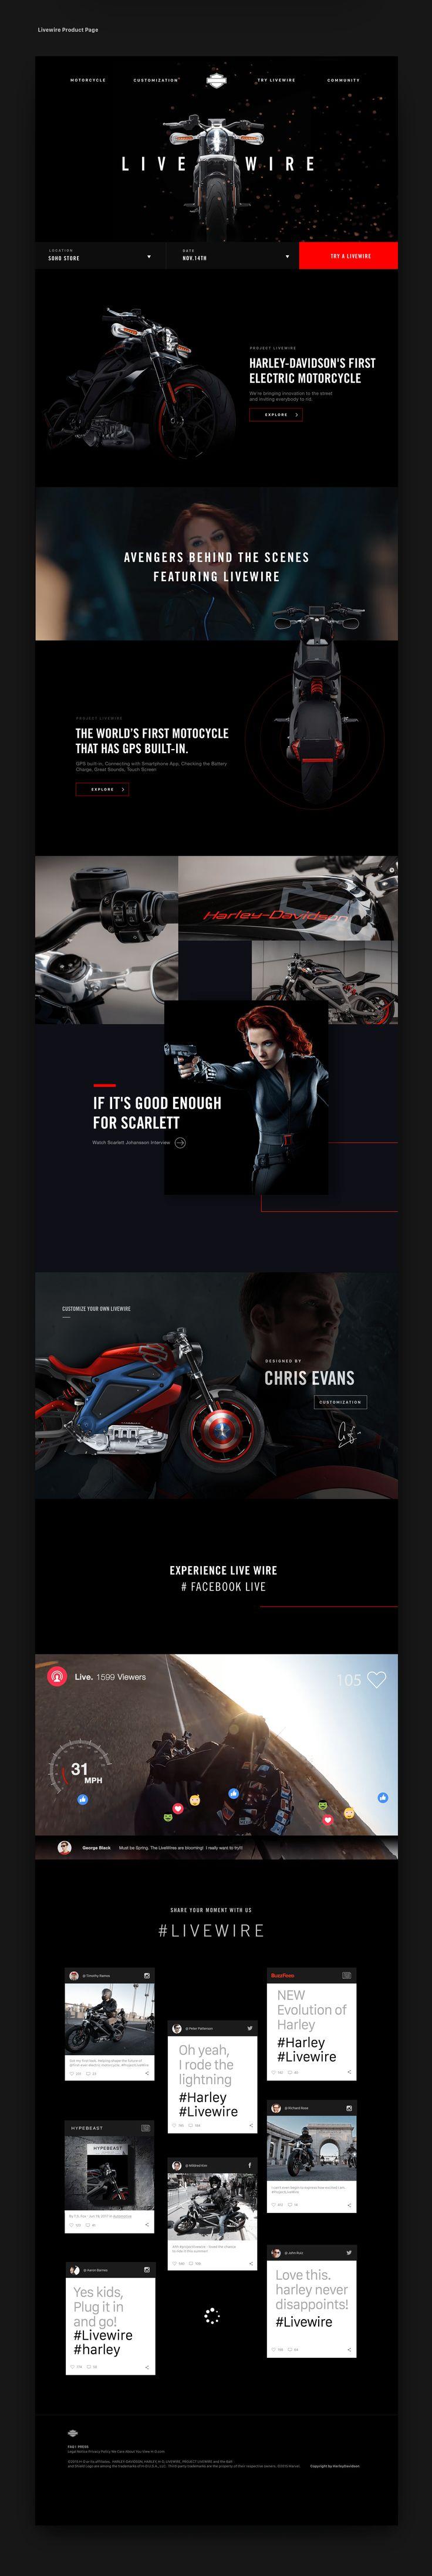 Harley Davidson - Project Livewire Website Redesign on Behance